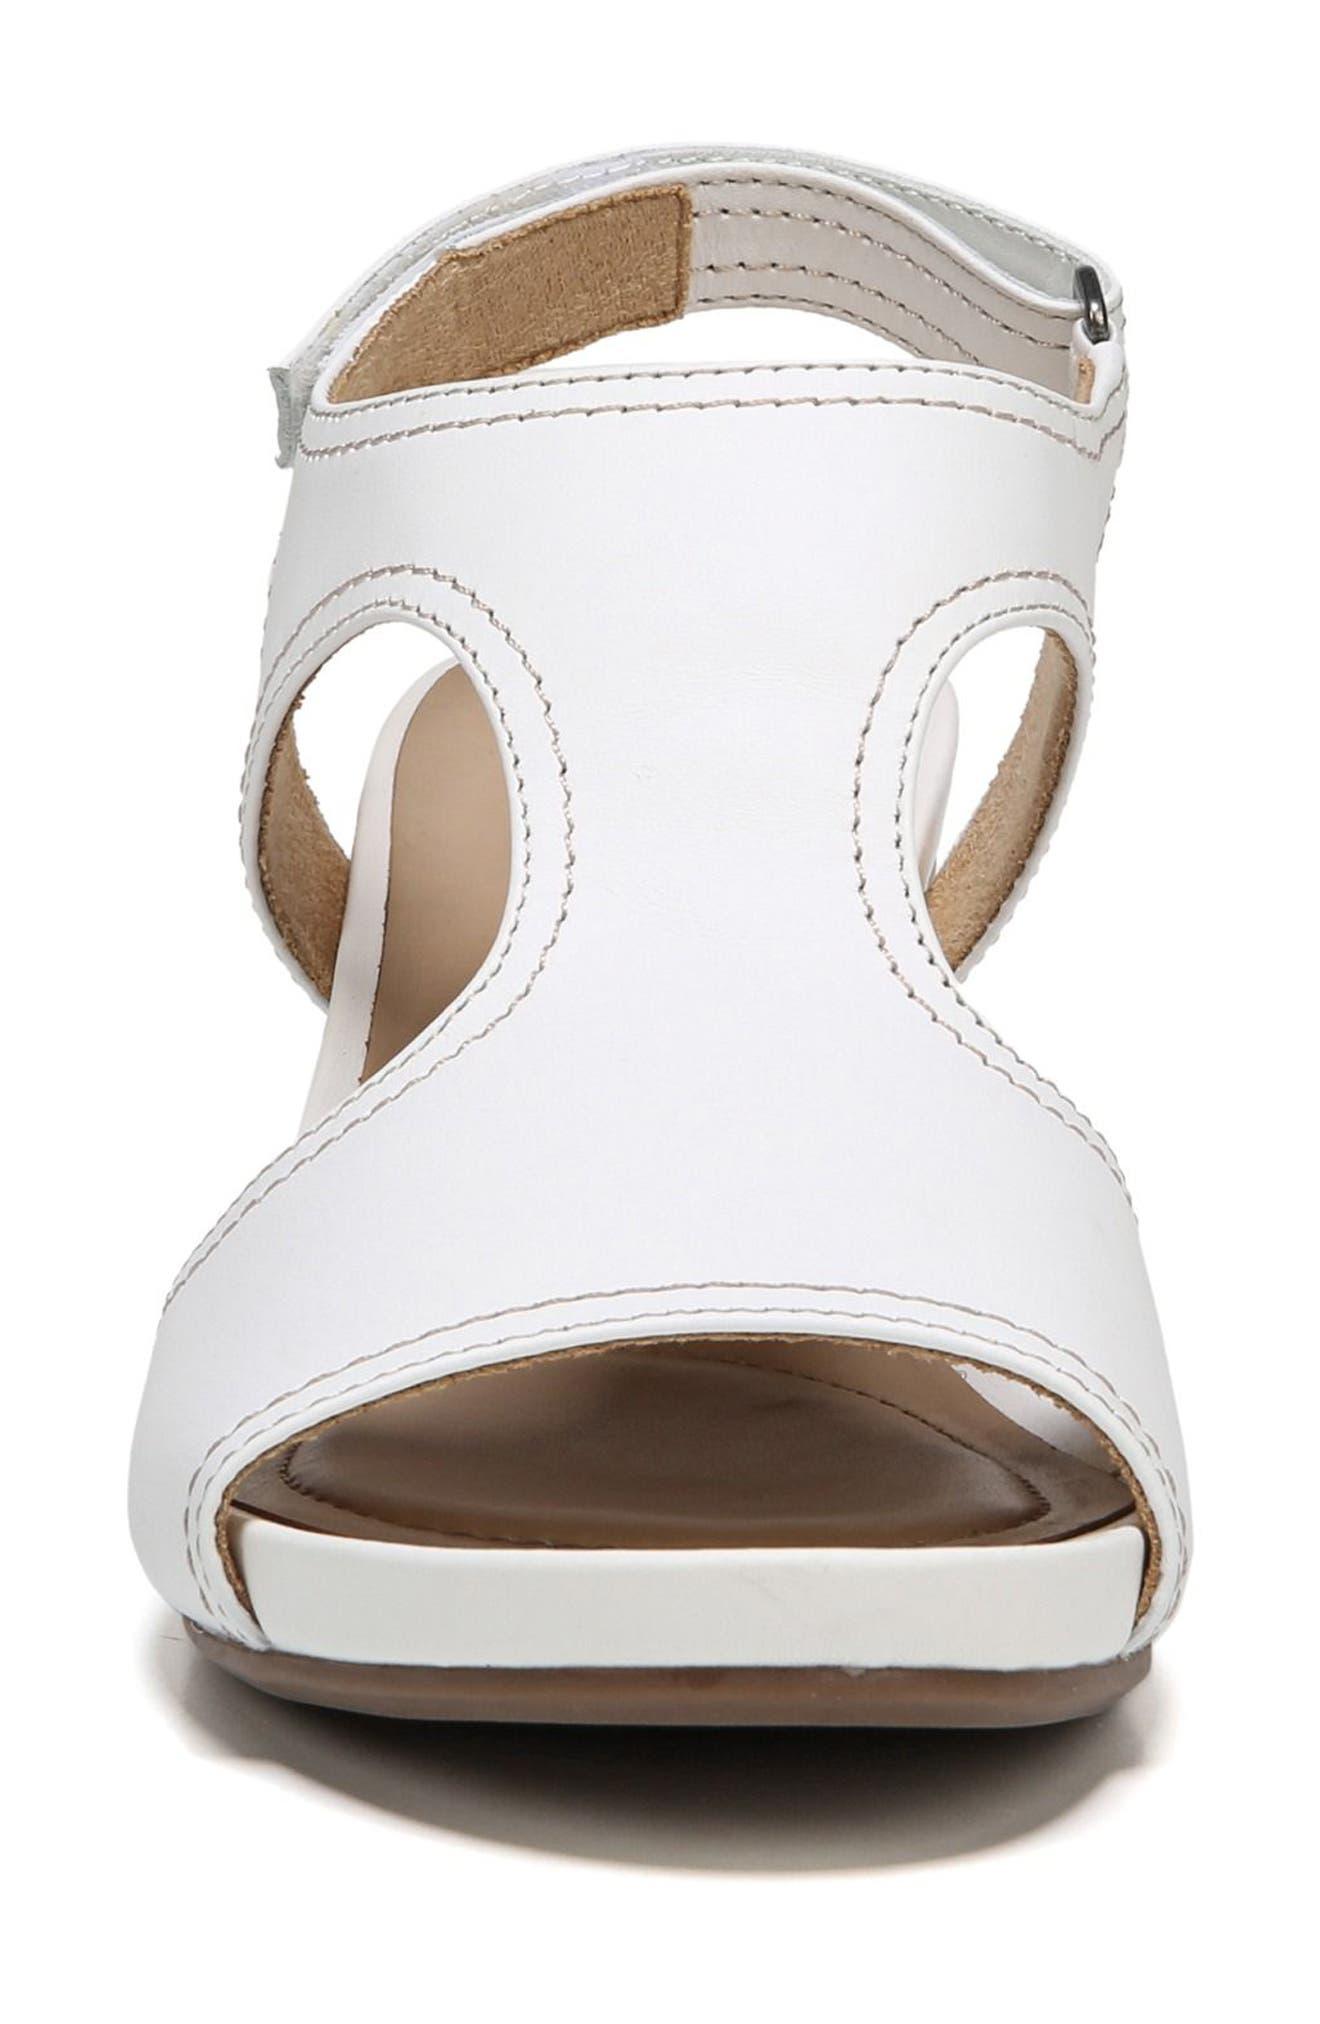 Cinda Wedge Sandal,                             Alternate thumbnail 4, color,                             White Leather